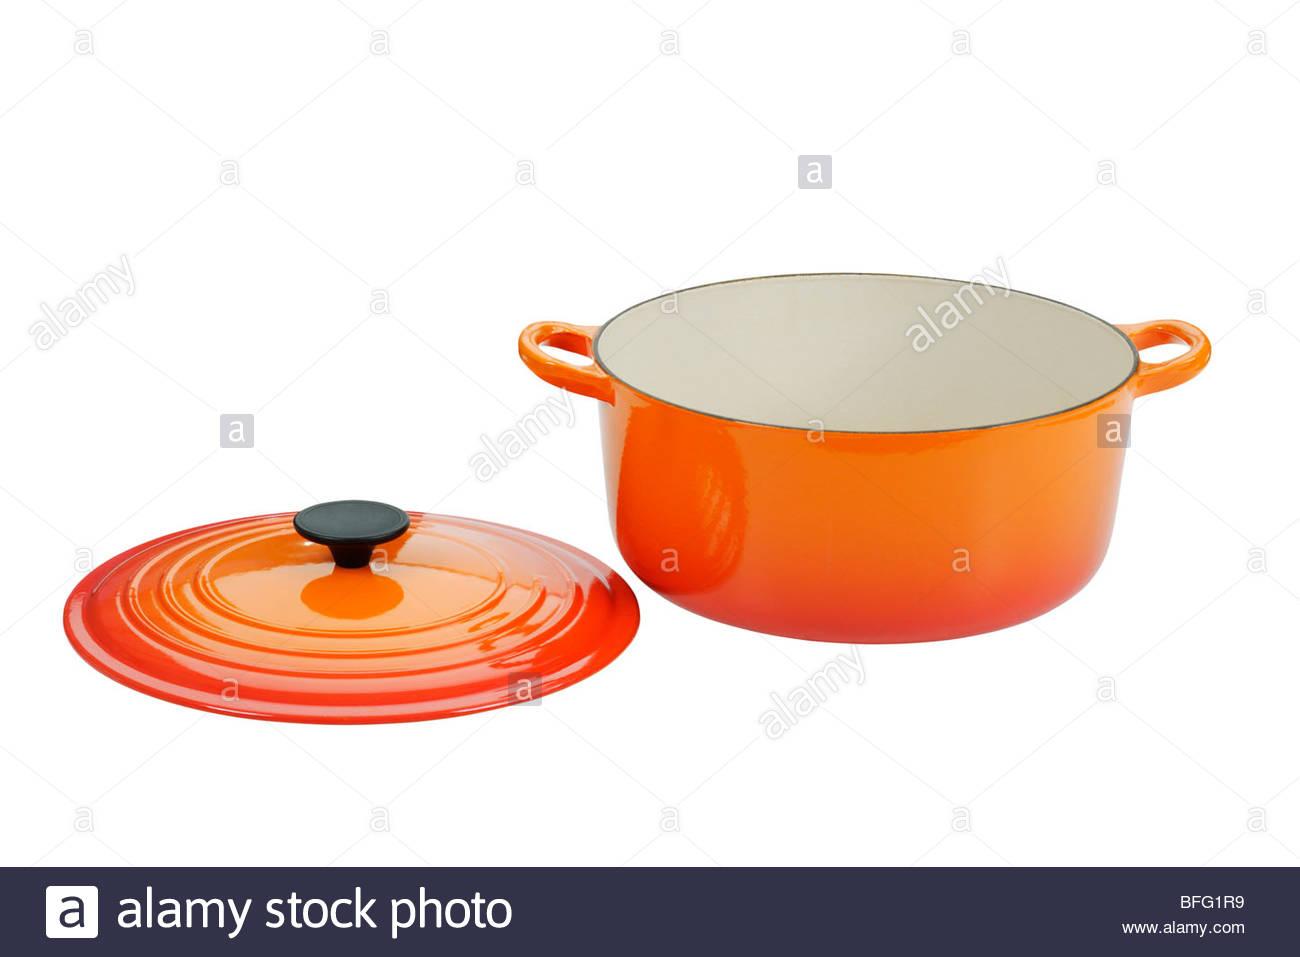 Cast iron cooking pot - Stock Image